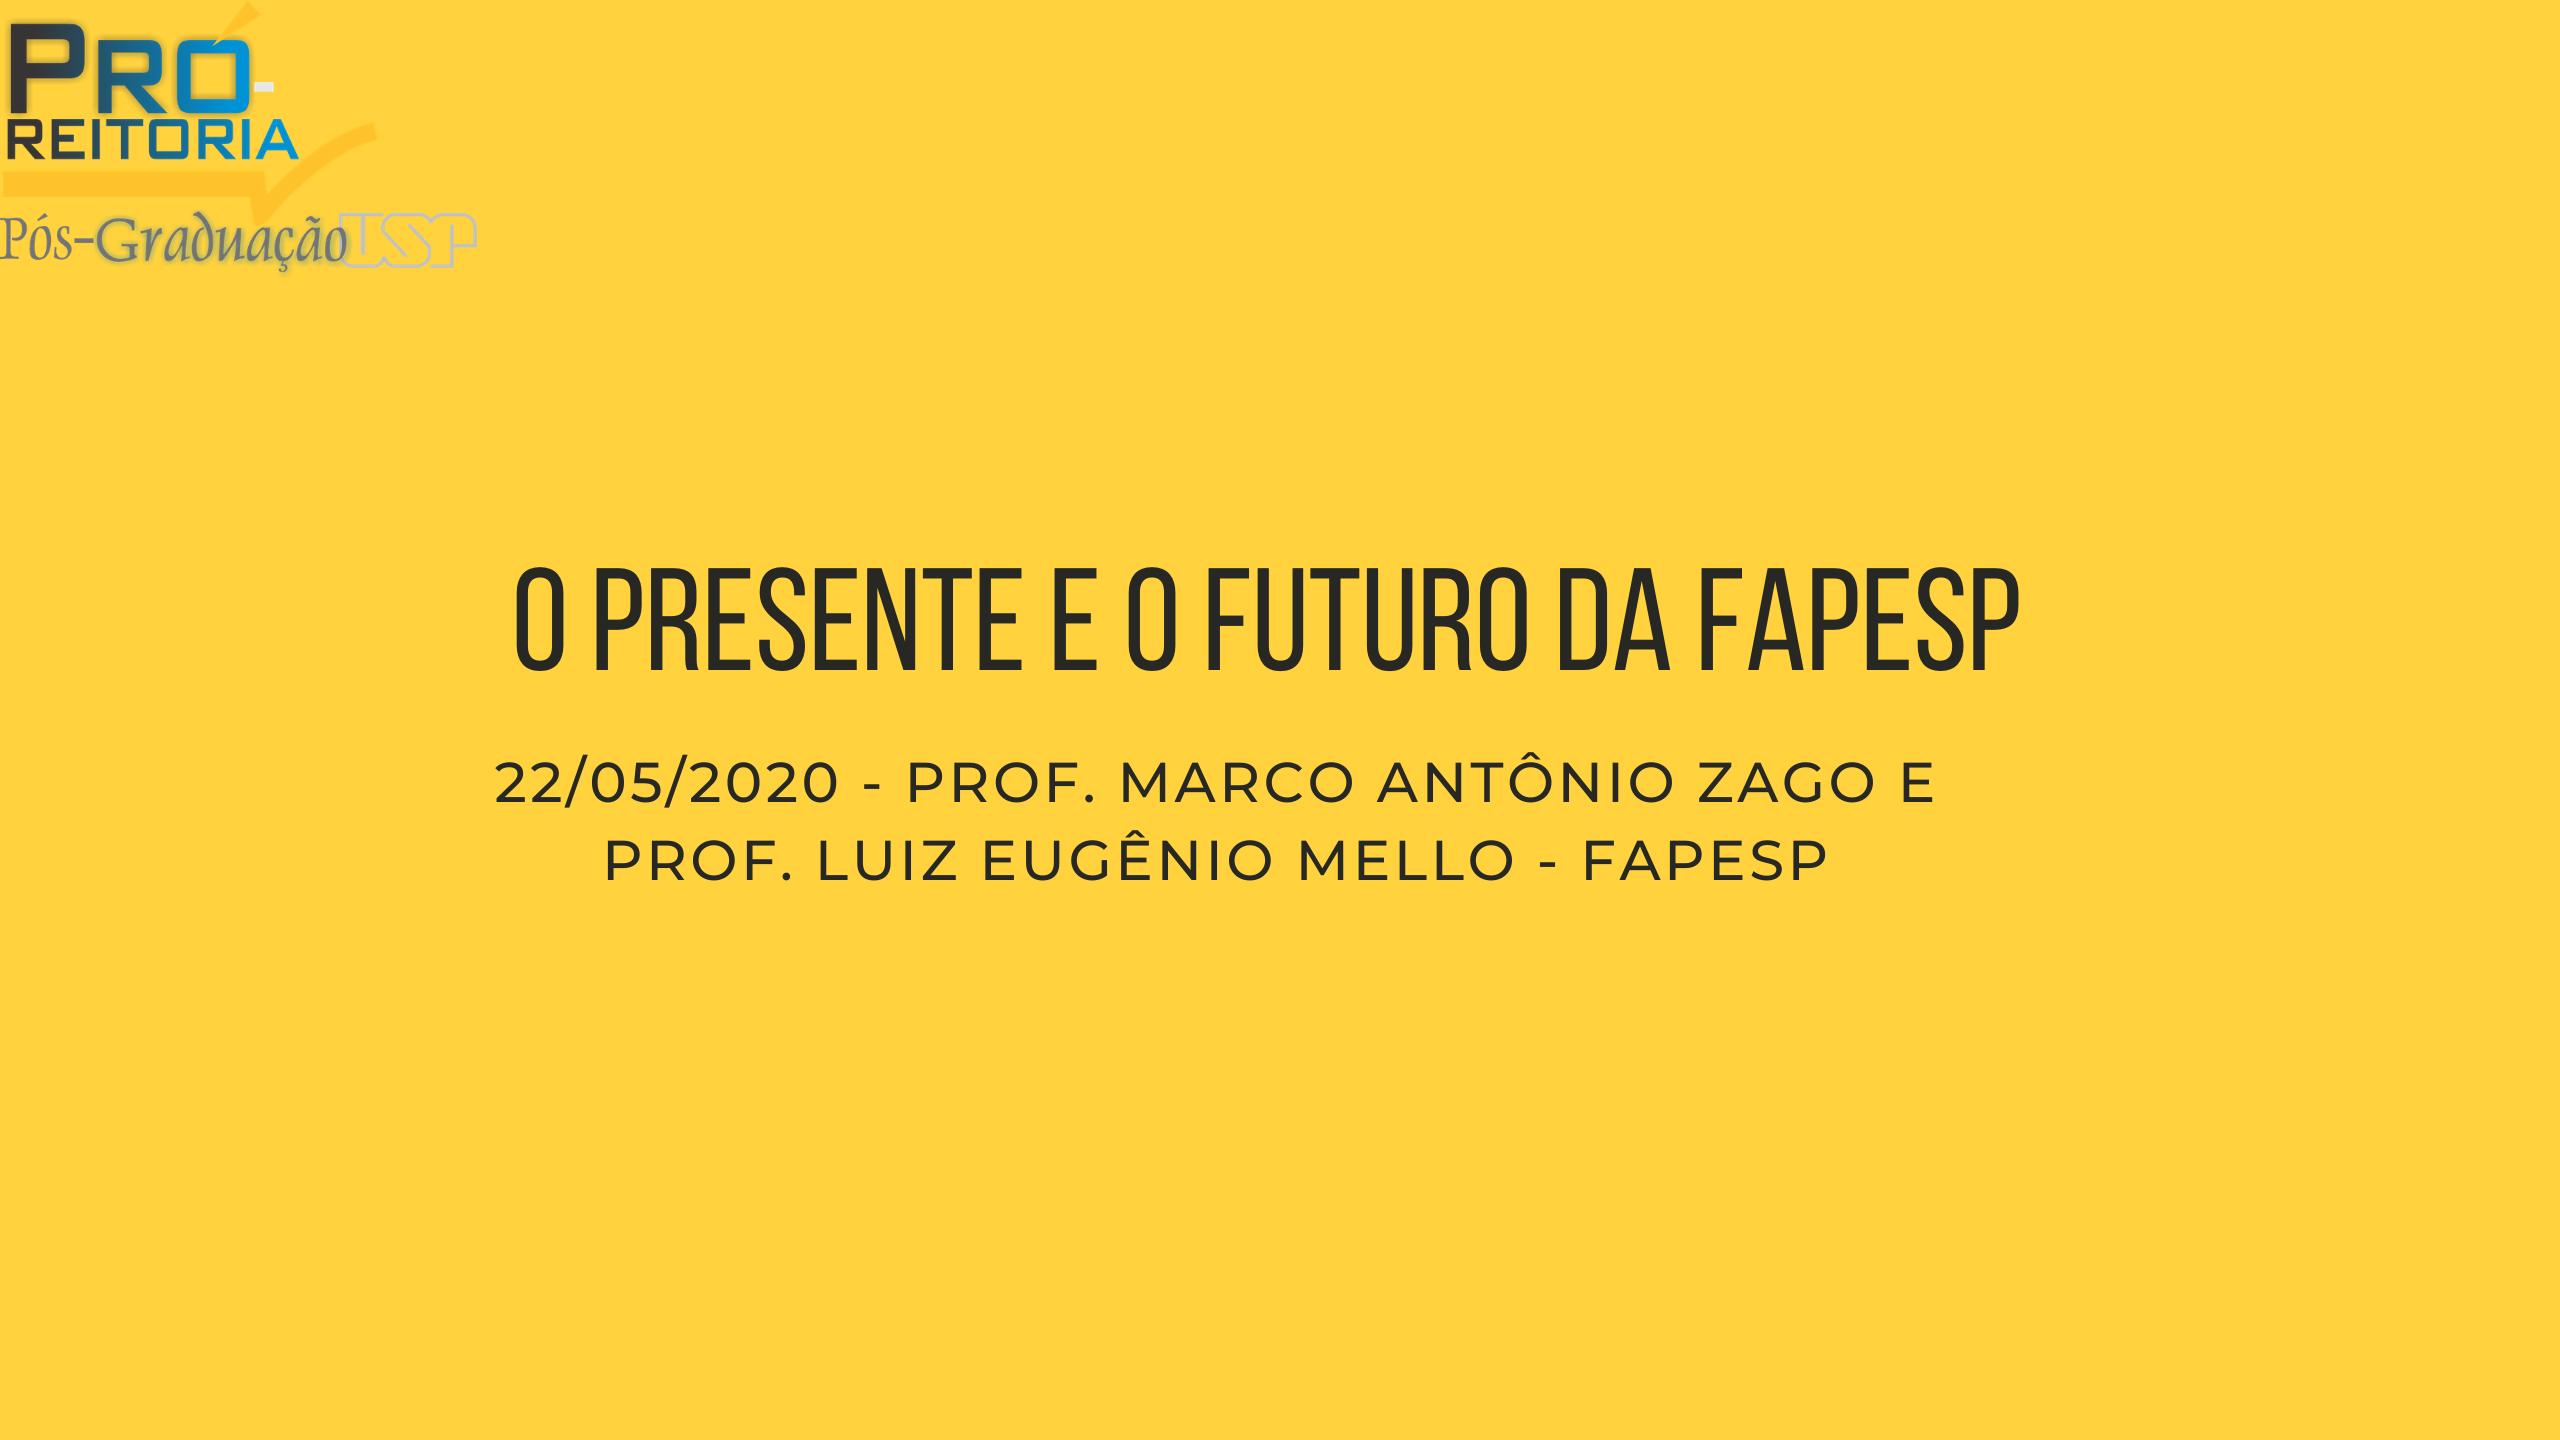 O presente e o futuro da FAPESP